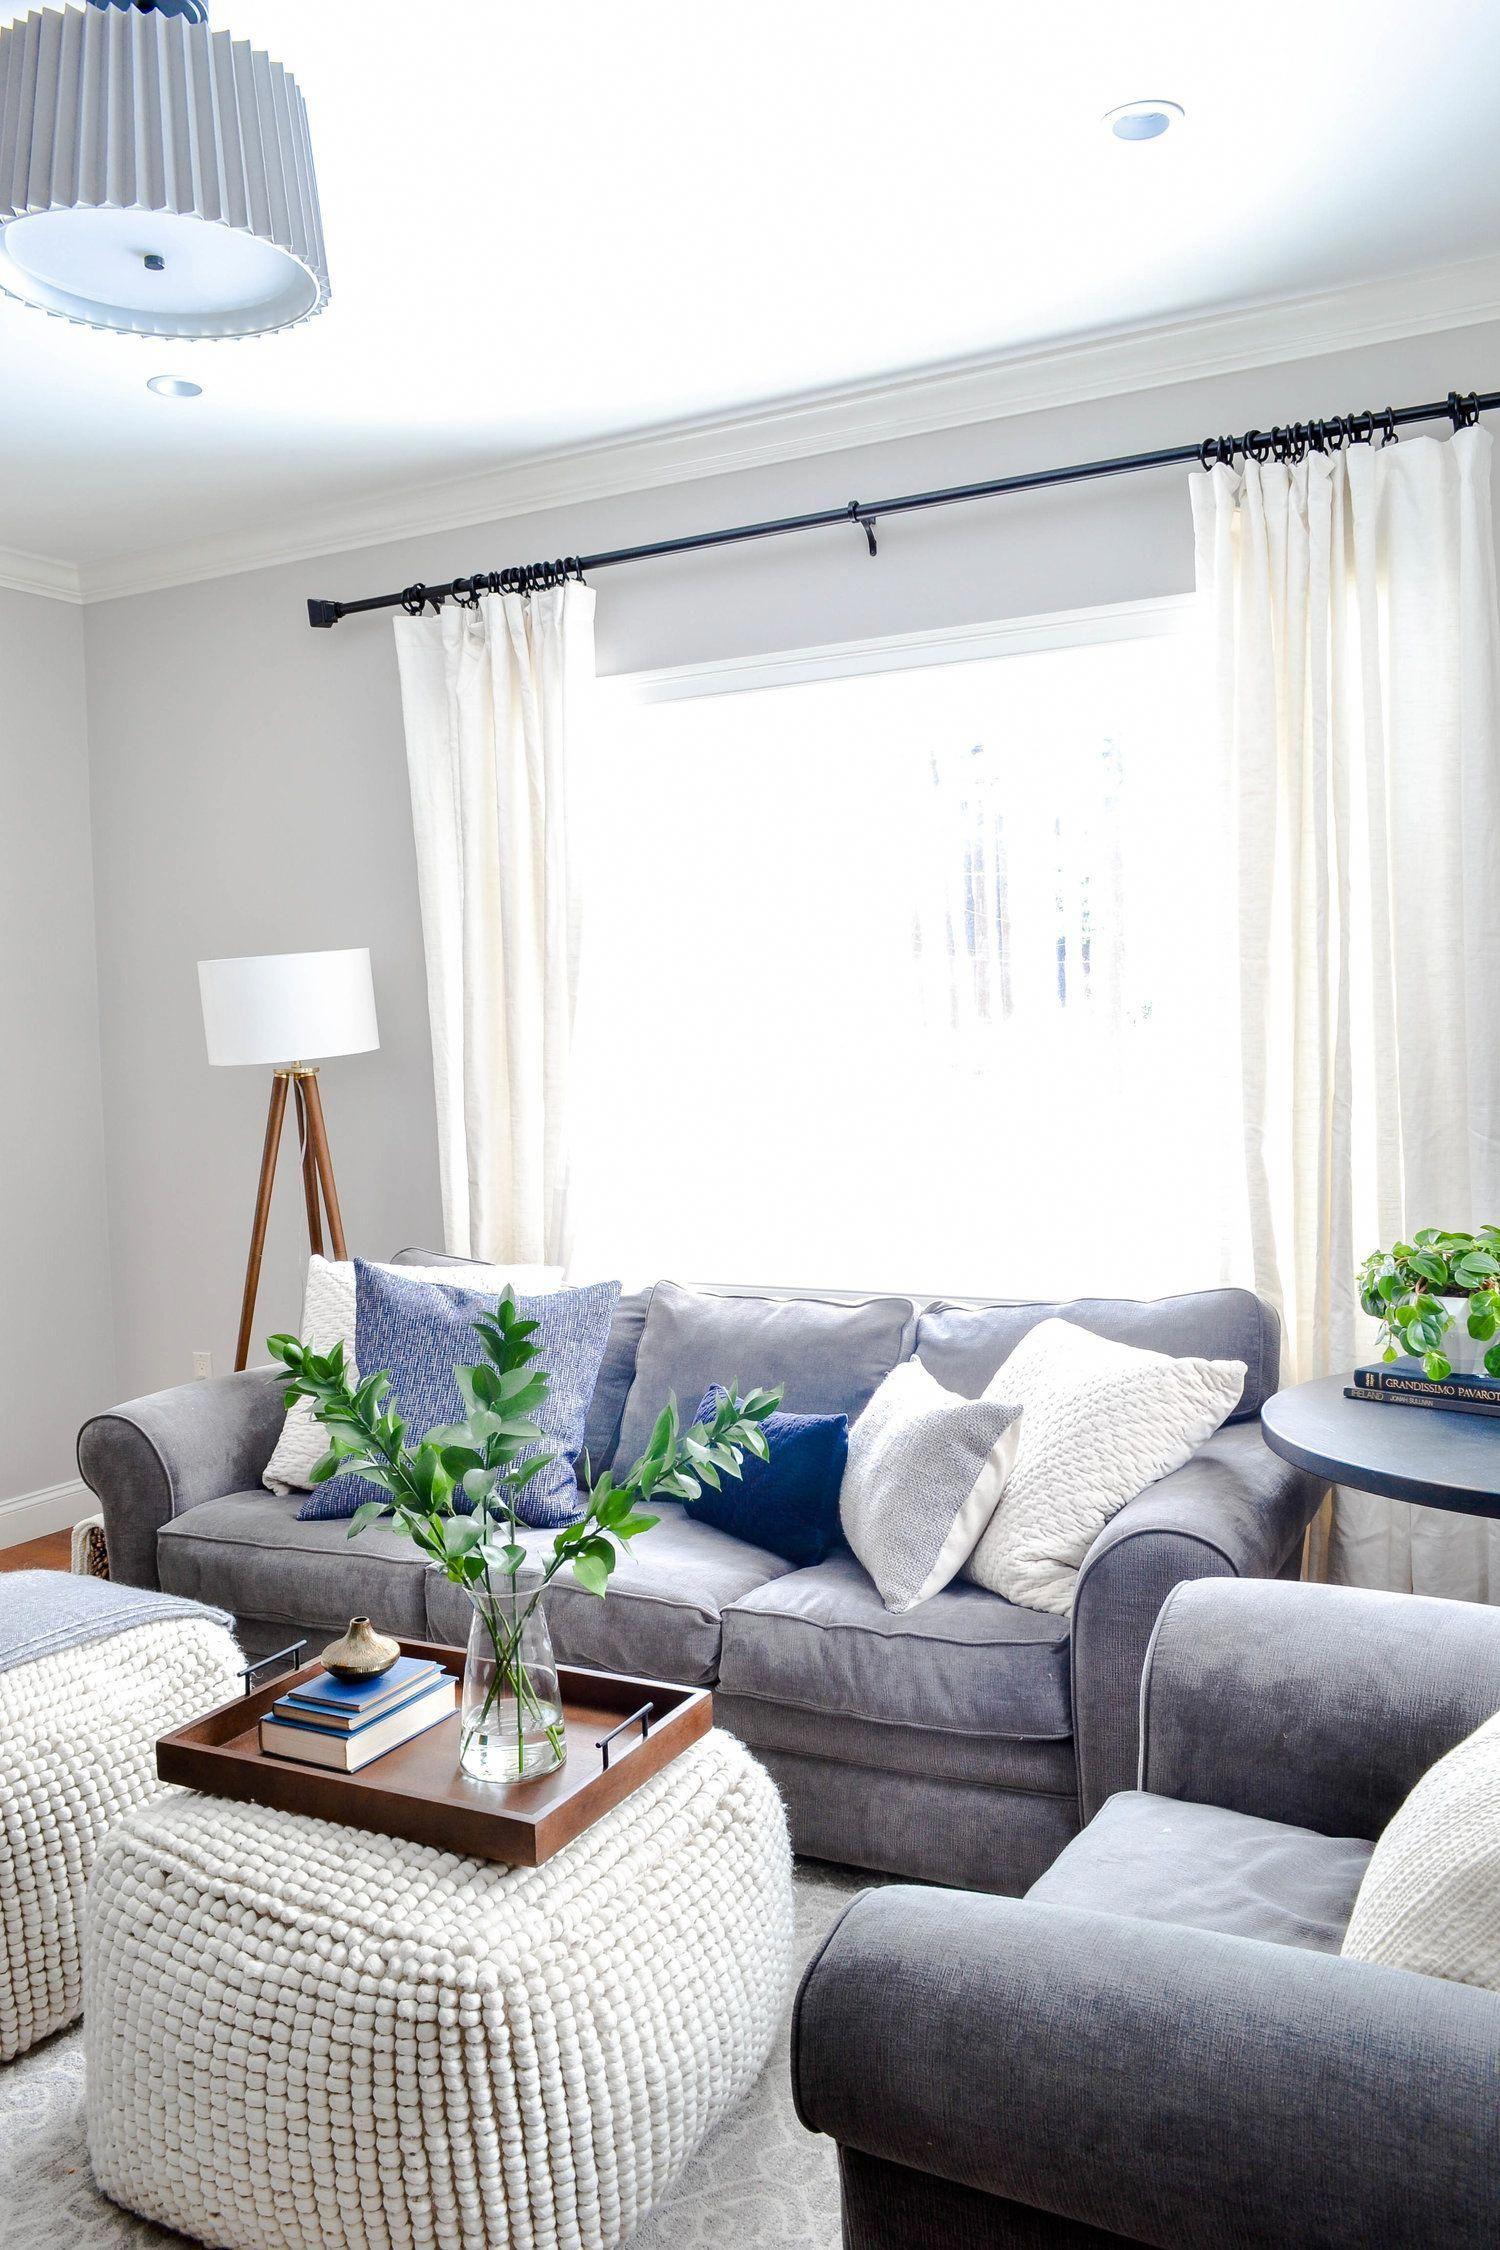 50 Cozy Blue Living Room Design Ideas In 2020 Blue Living Room